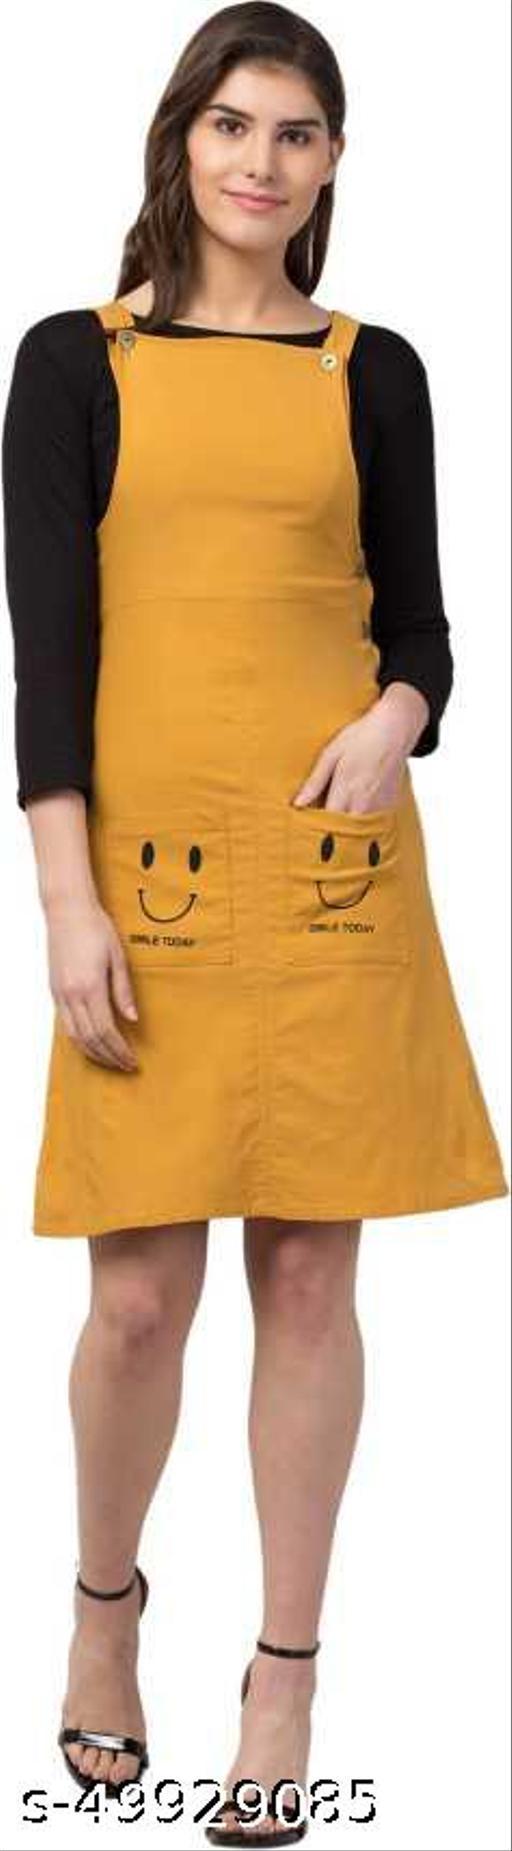 MUSTARD SMILEY Dresses